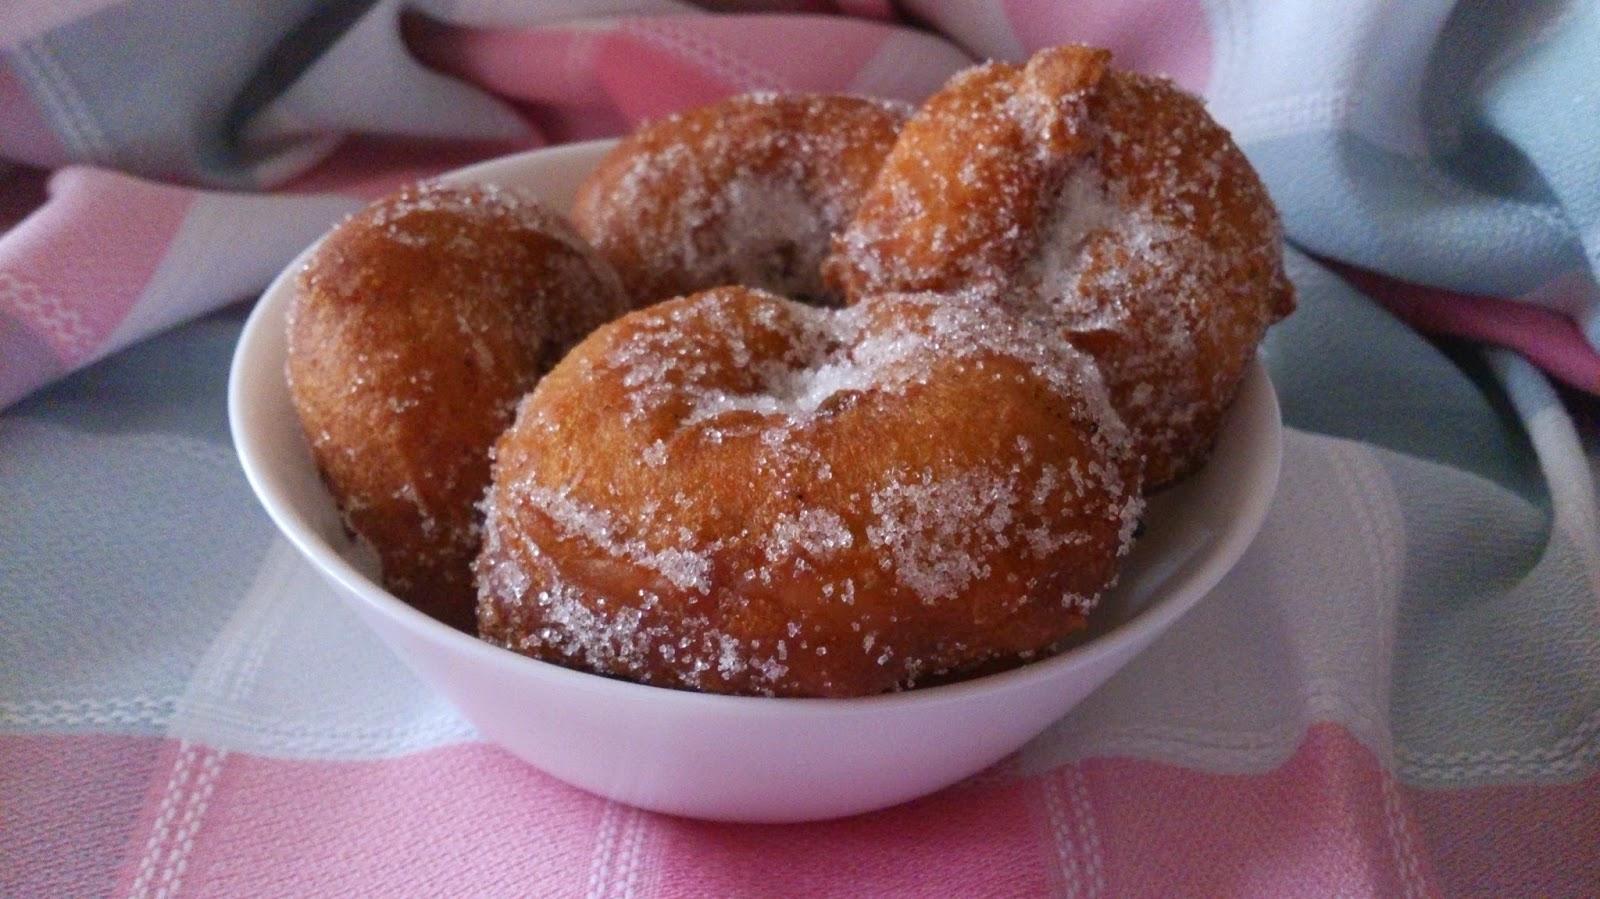 roscos fritos semana santa navidad abuela tradicionales andalucia andaluces